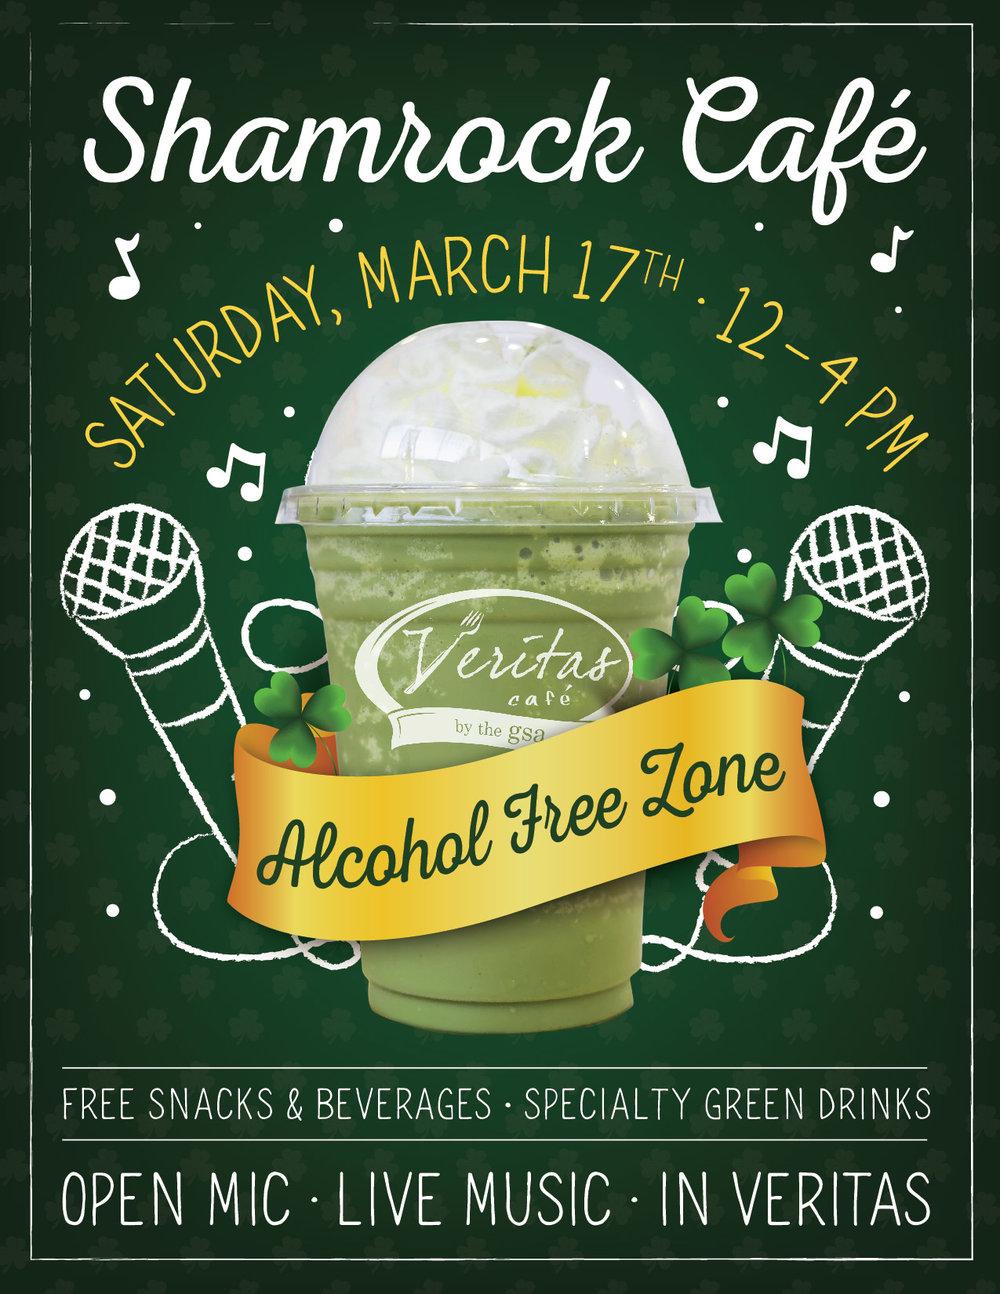 shamrock-cafe-01.jpg